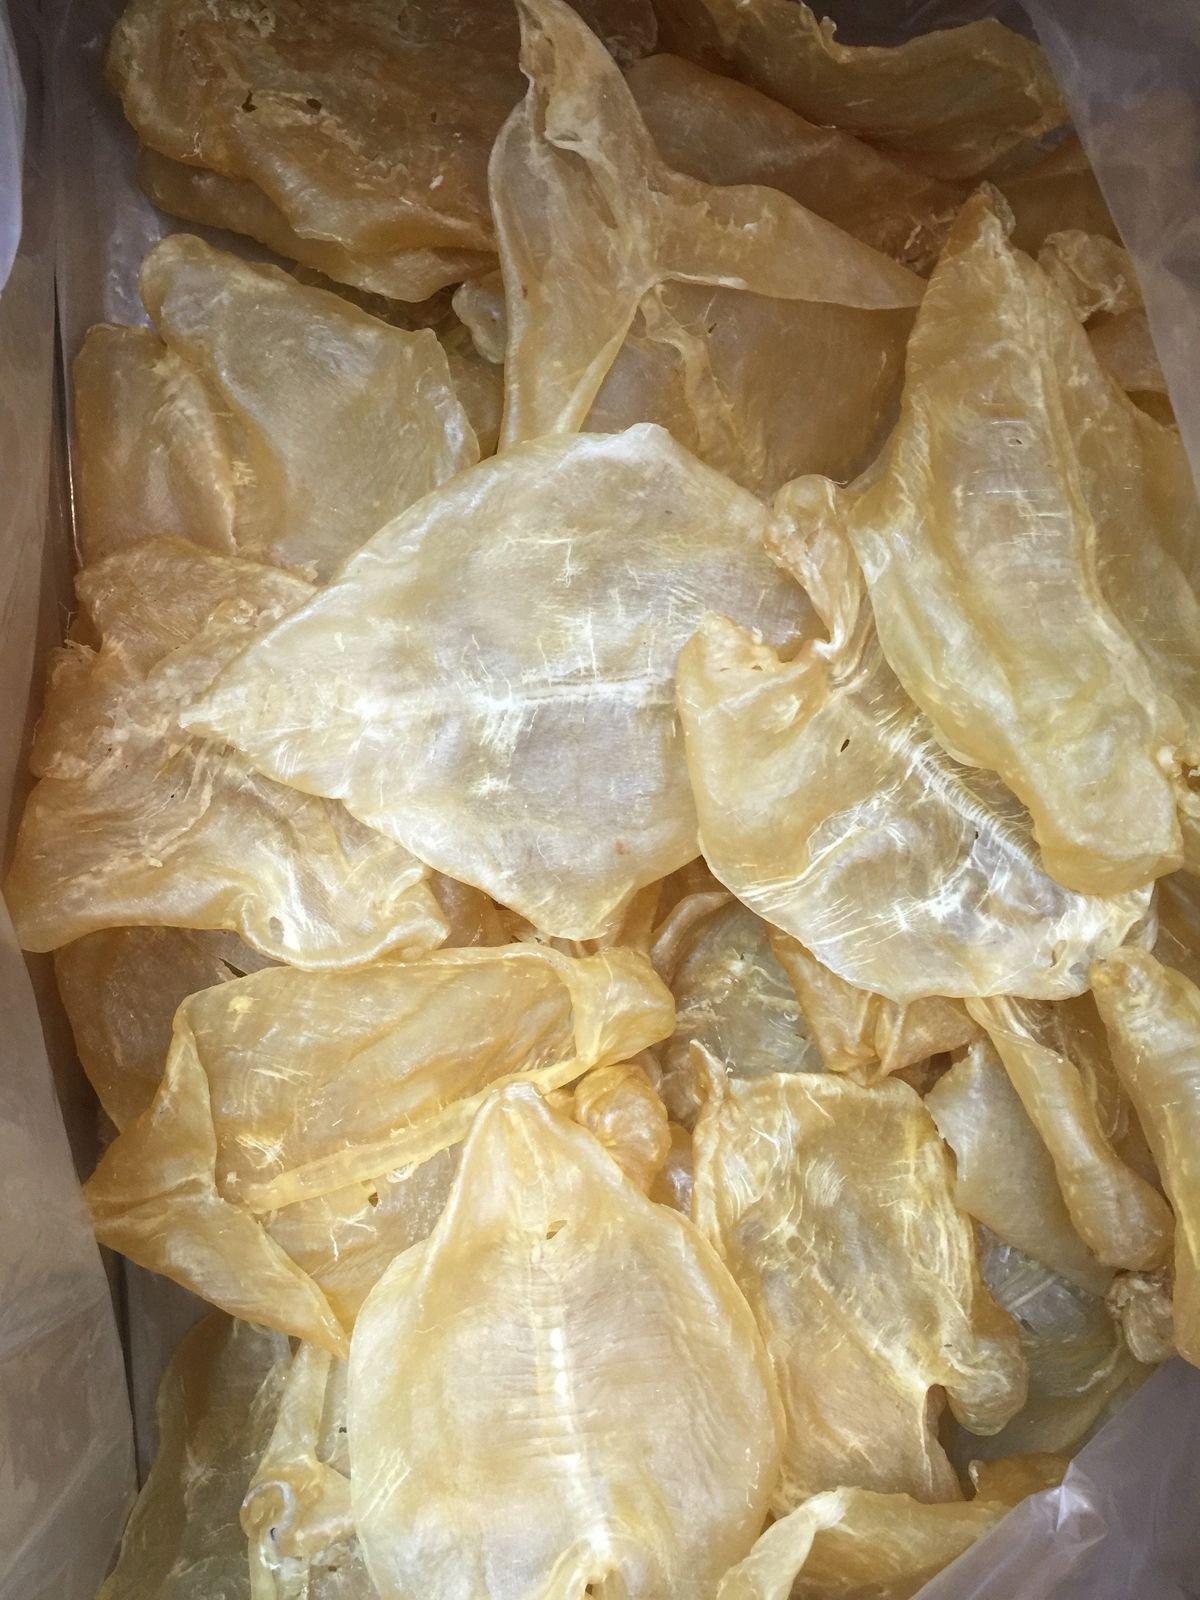 China Good Food Dried Seafood Opened Fish Maw / Hua Jiao 鴨巴膠 魚肚 Worldwide FREE AIRMAIL